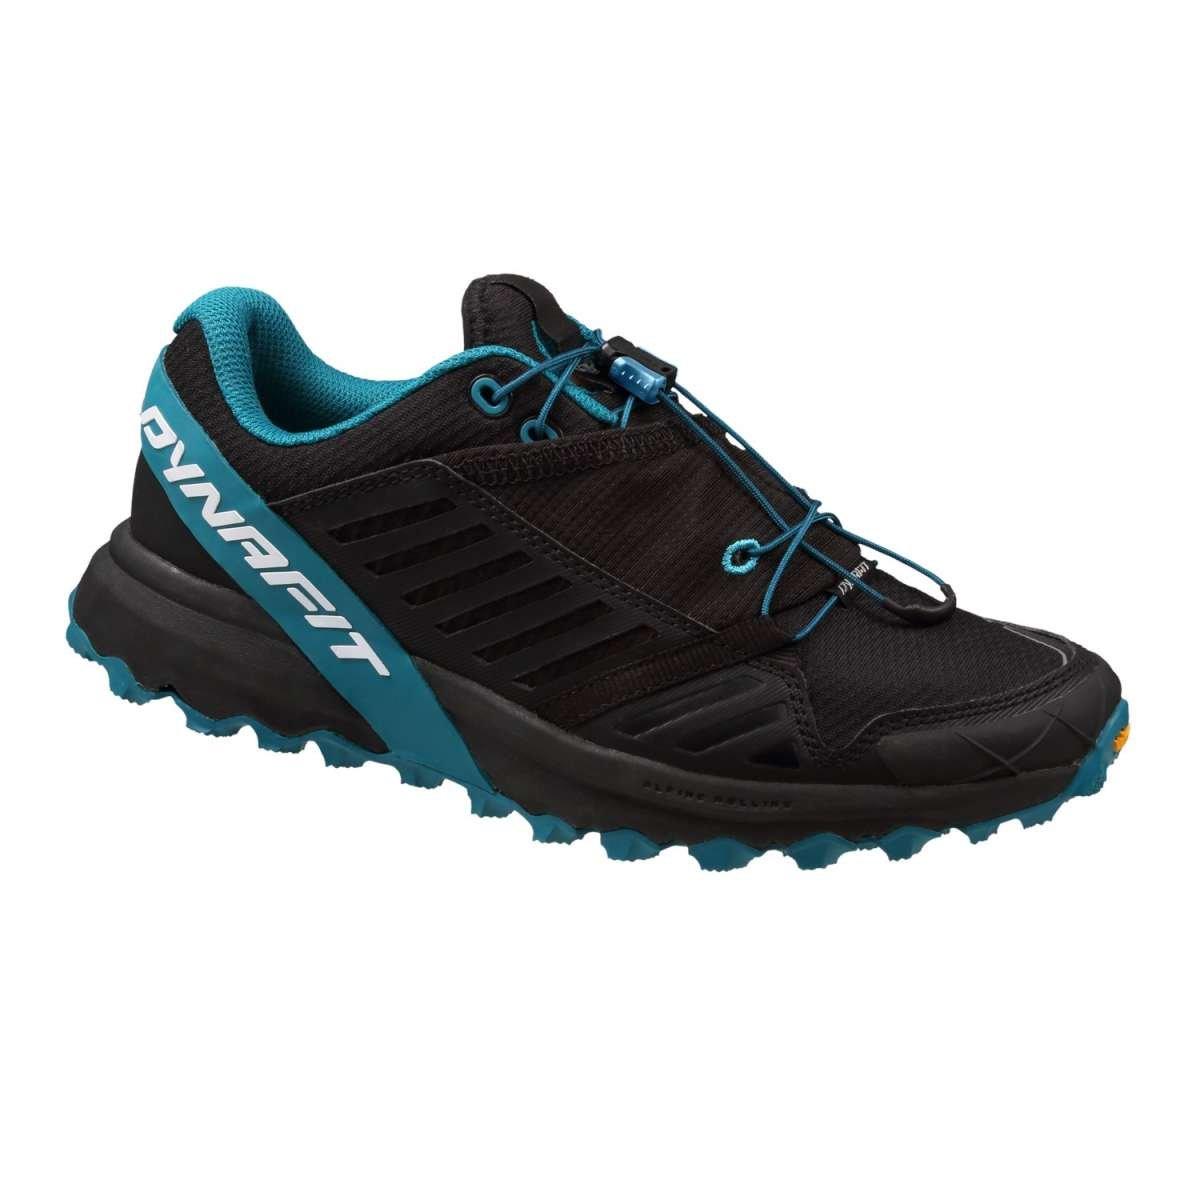 Dynafit Women's Alpine Pro Trail Running Shoes B077HH4981 8 B(M) US Black Out / Malta